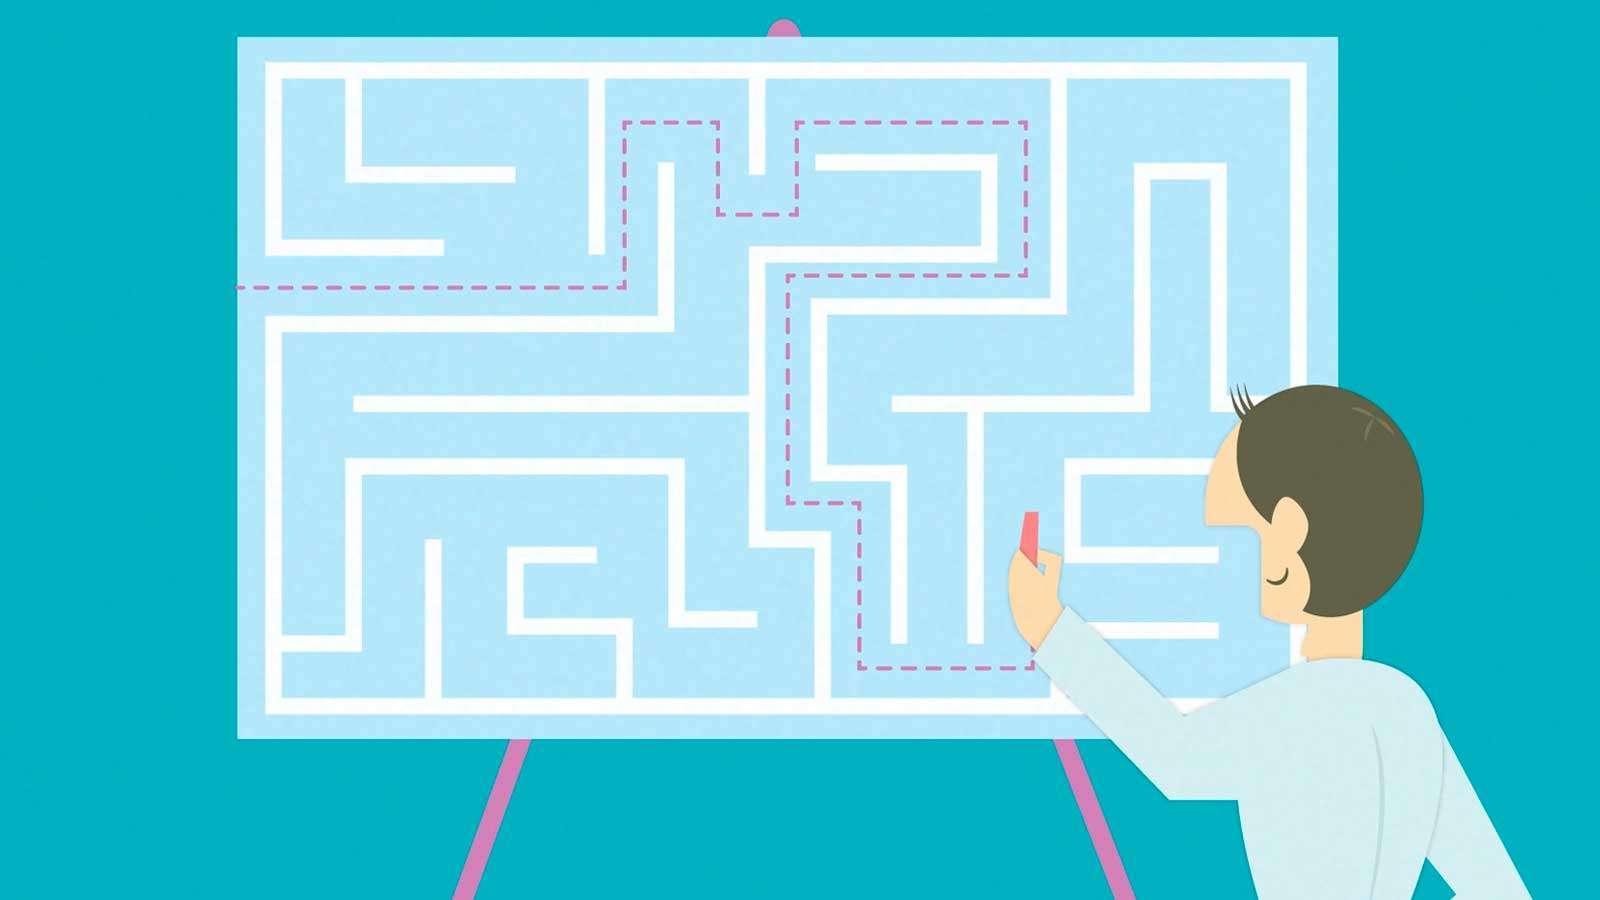 pasos-elegir-herramienta-automatizacion-de-marketing-correcta-para-tu-agencia